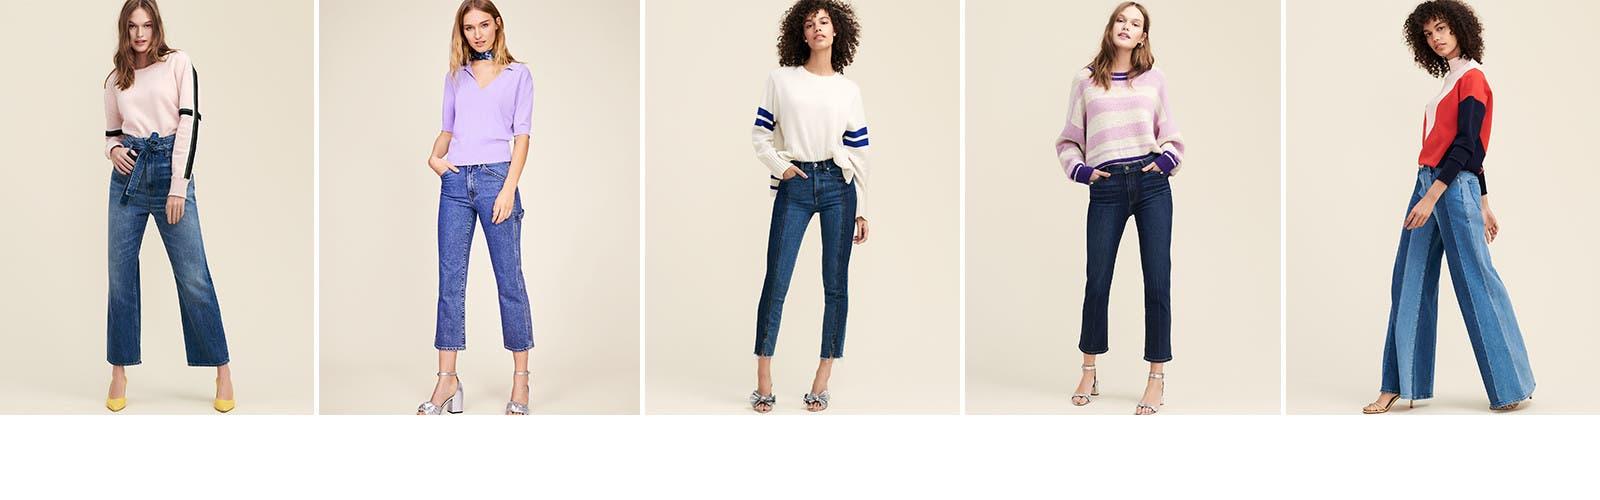 b0bc6edd496f Women s Jeans   Denim   Nordstrom